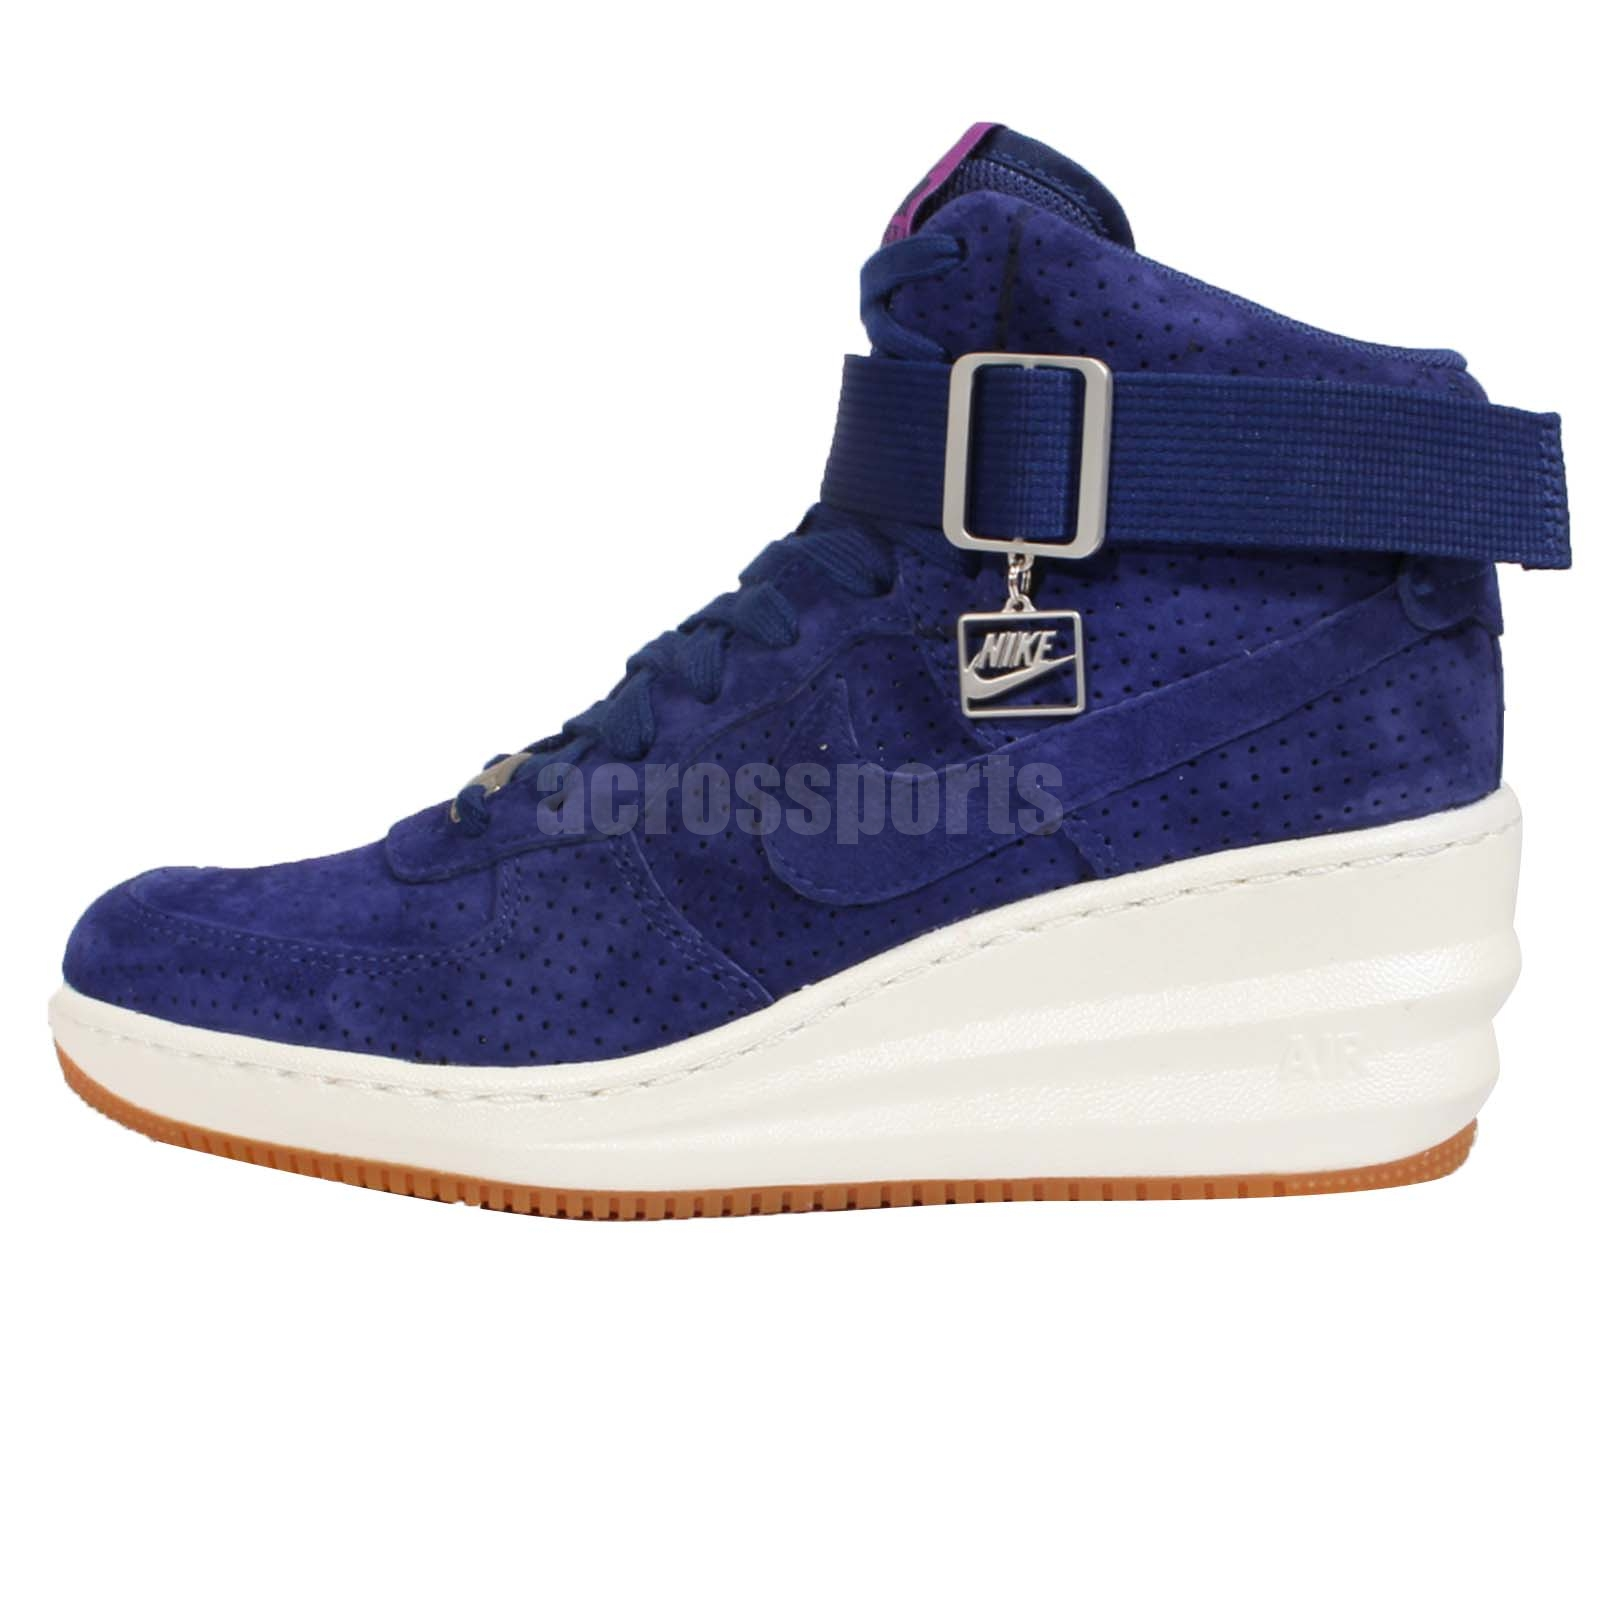 dbf3832bde4 Nike Lunar Force Sky Hi Wedge Sneaker Shoes Sky Hi News